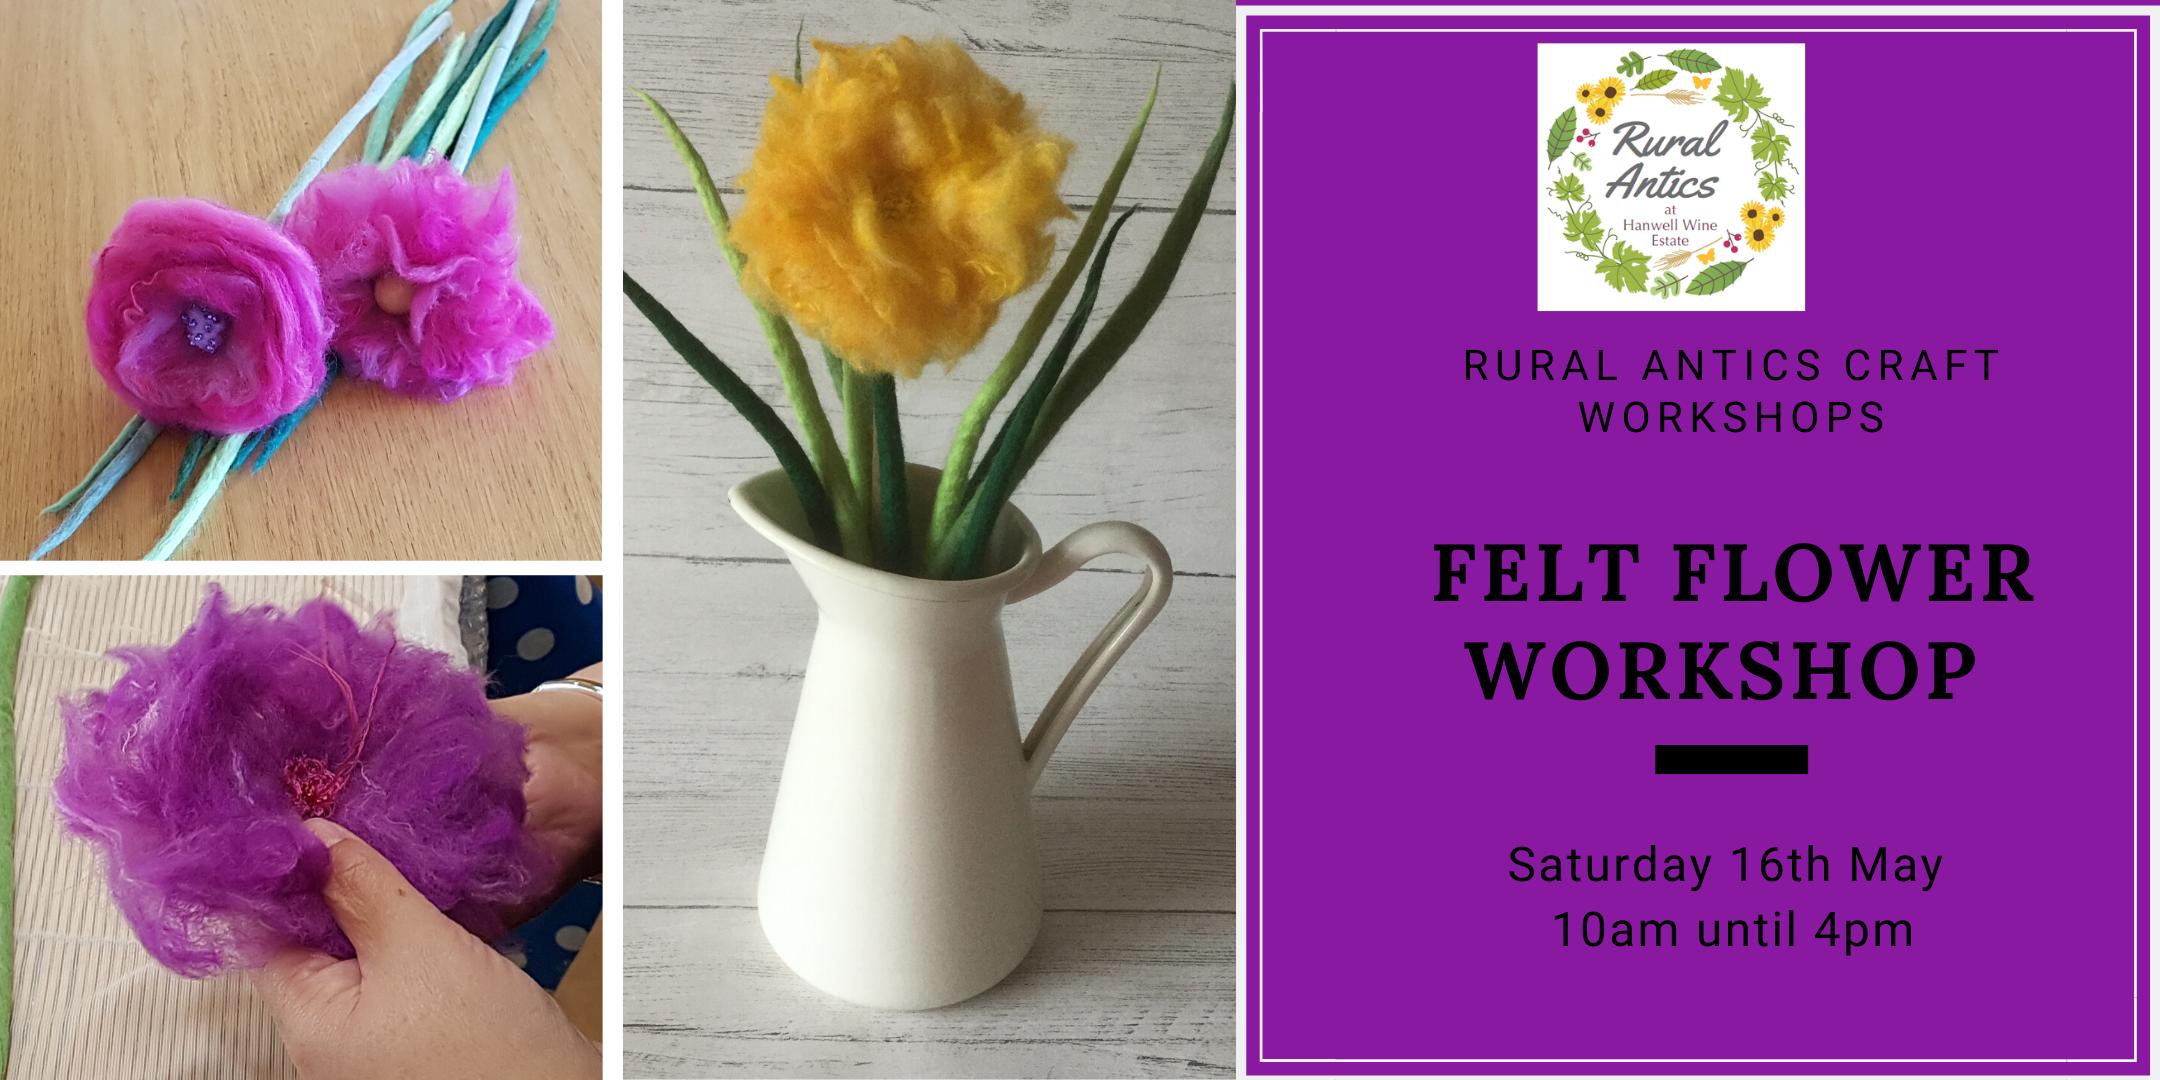 Felt Flower Workshop